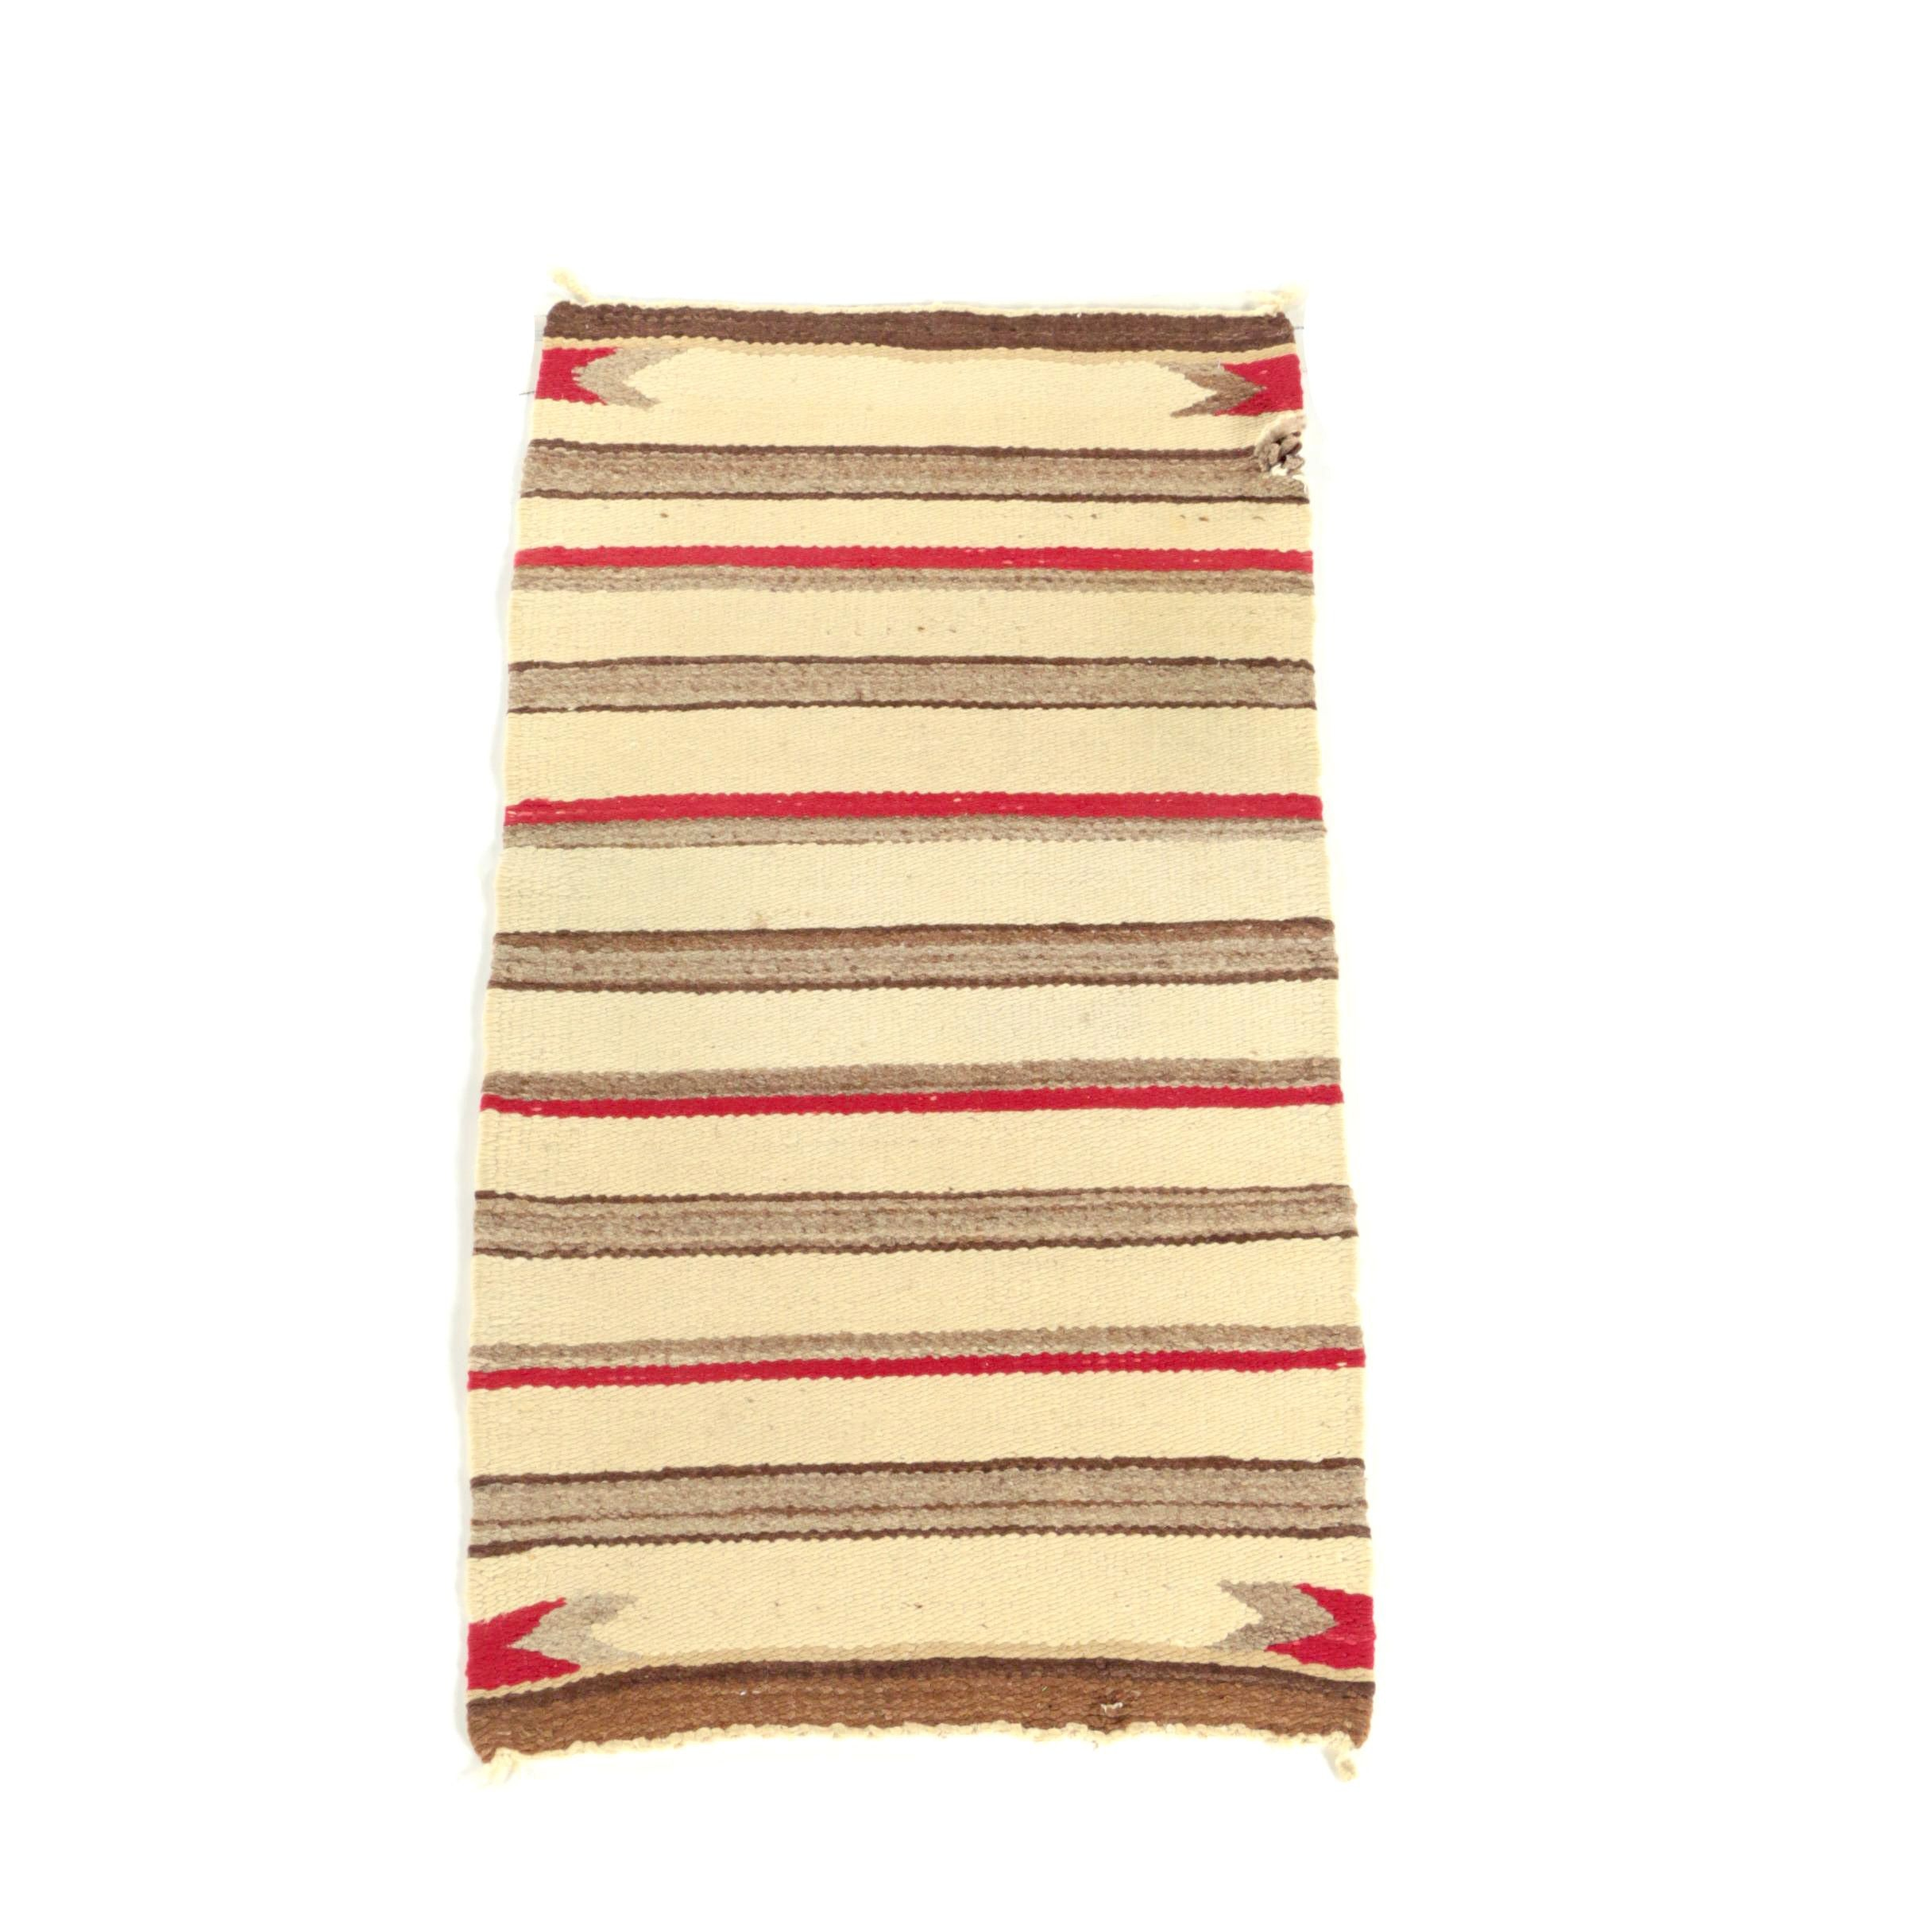 Semi-Antique Navajo Wool Accent Rug